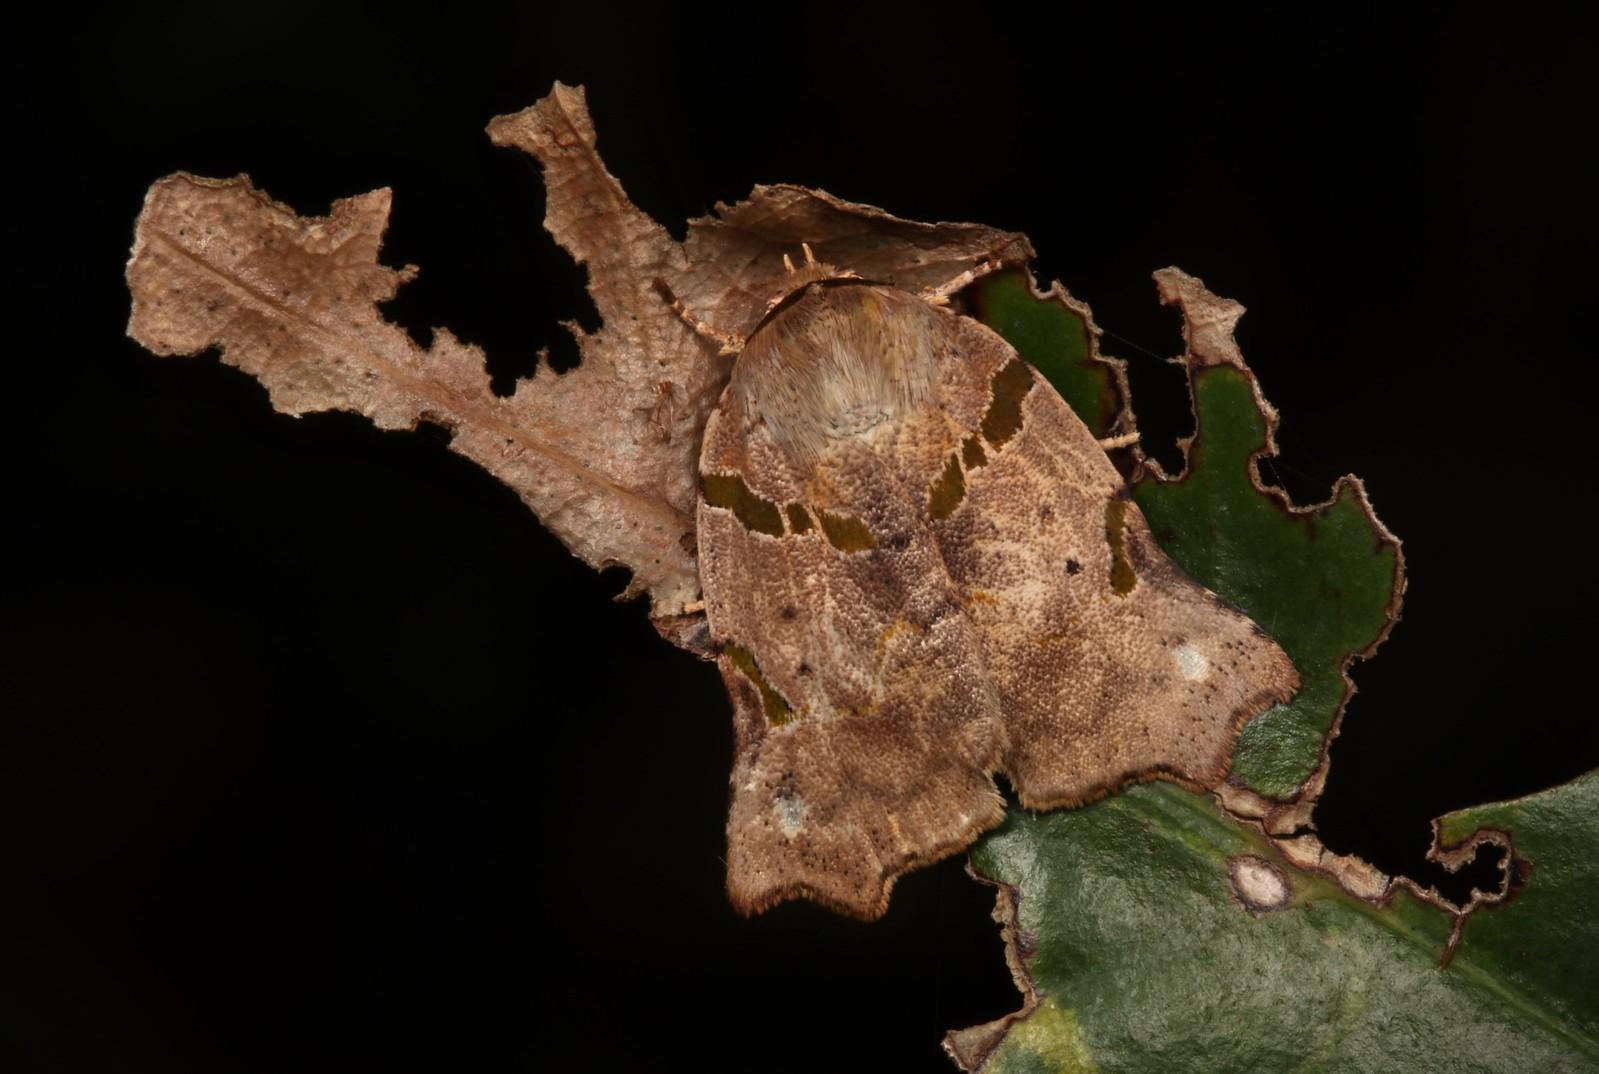 Nolid Moth (Tortriciforma chloroplaga, Chloephorinae, Nolidae)